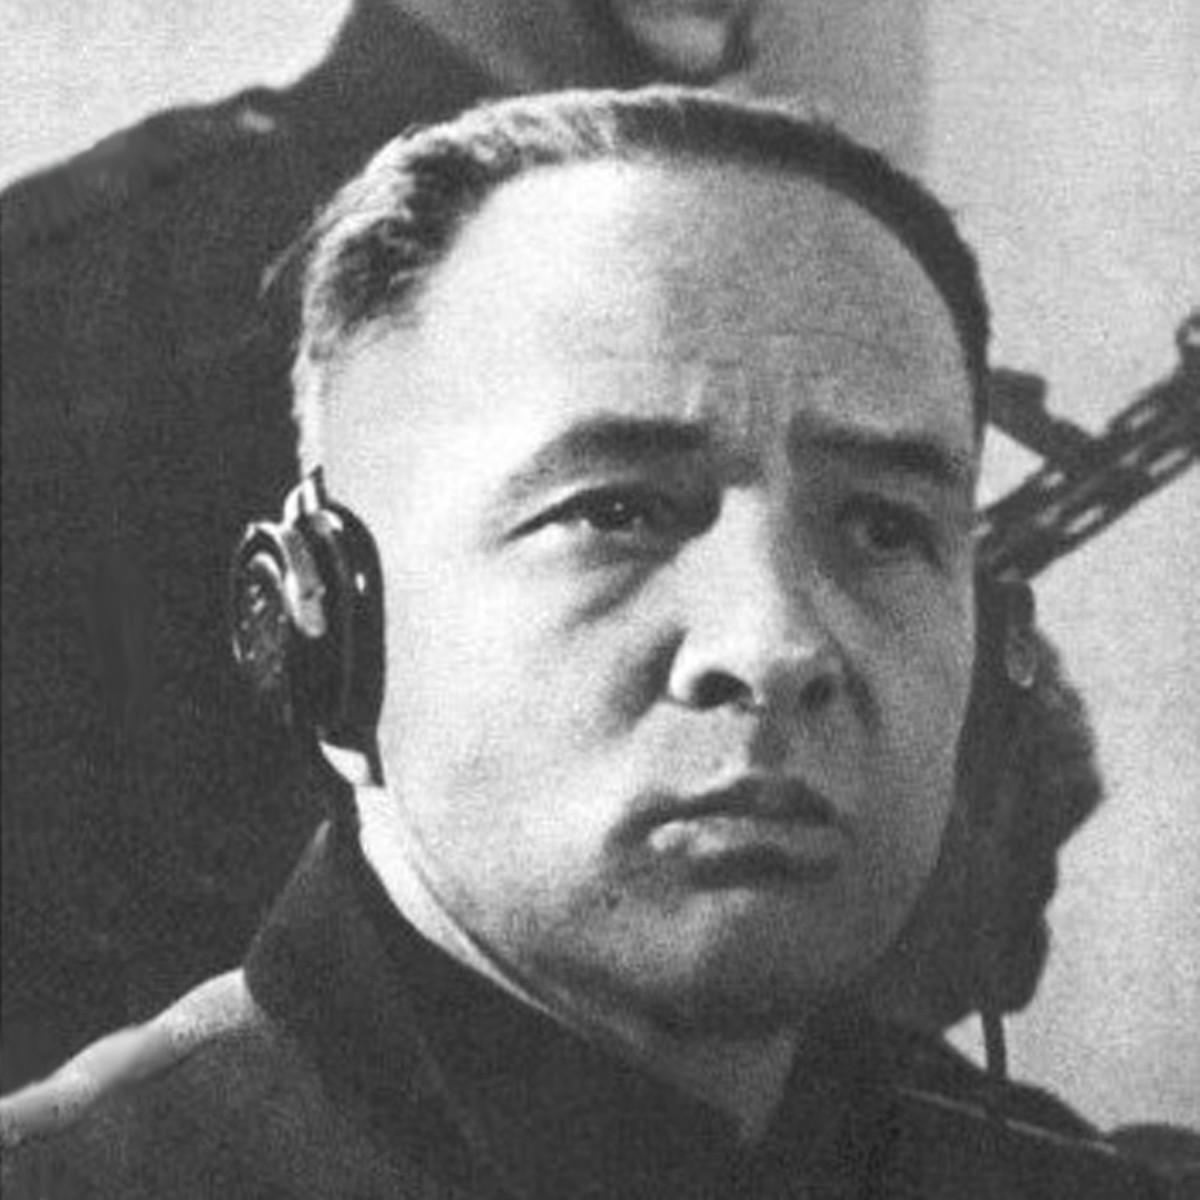 Commandant Rudolf Höss: The Hidden Truth Disclosed